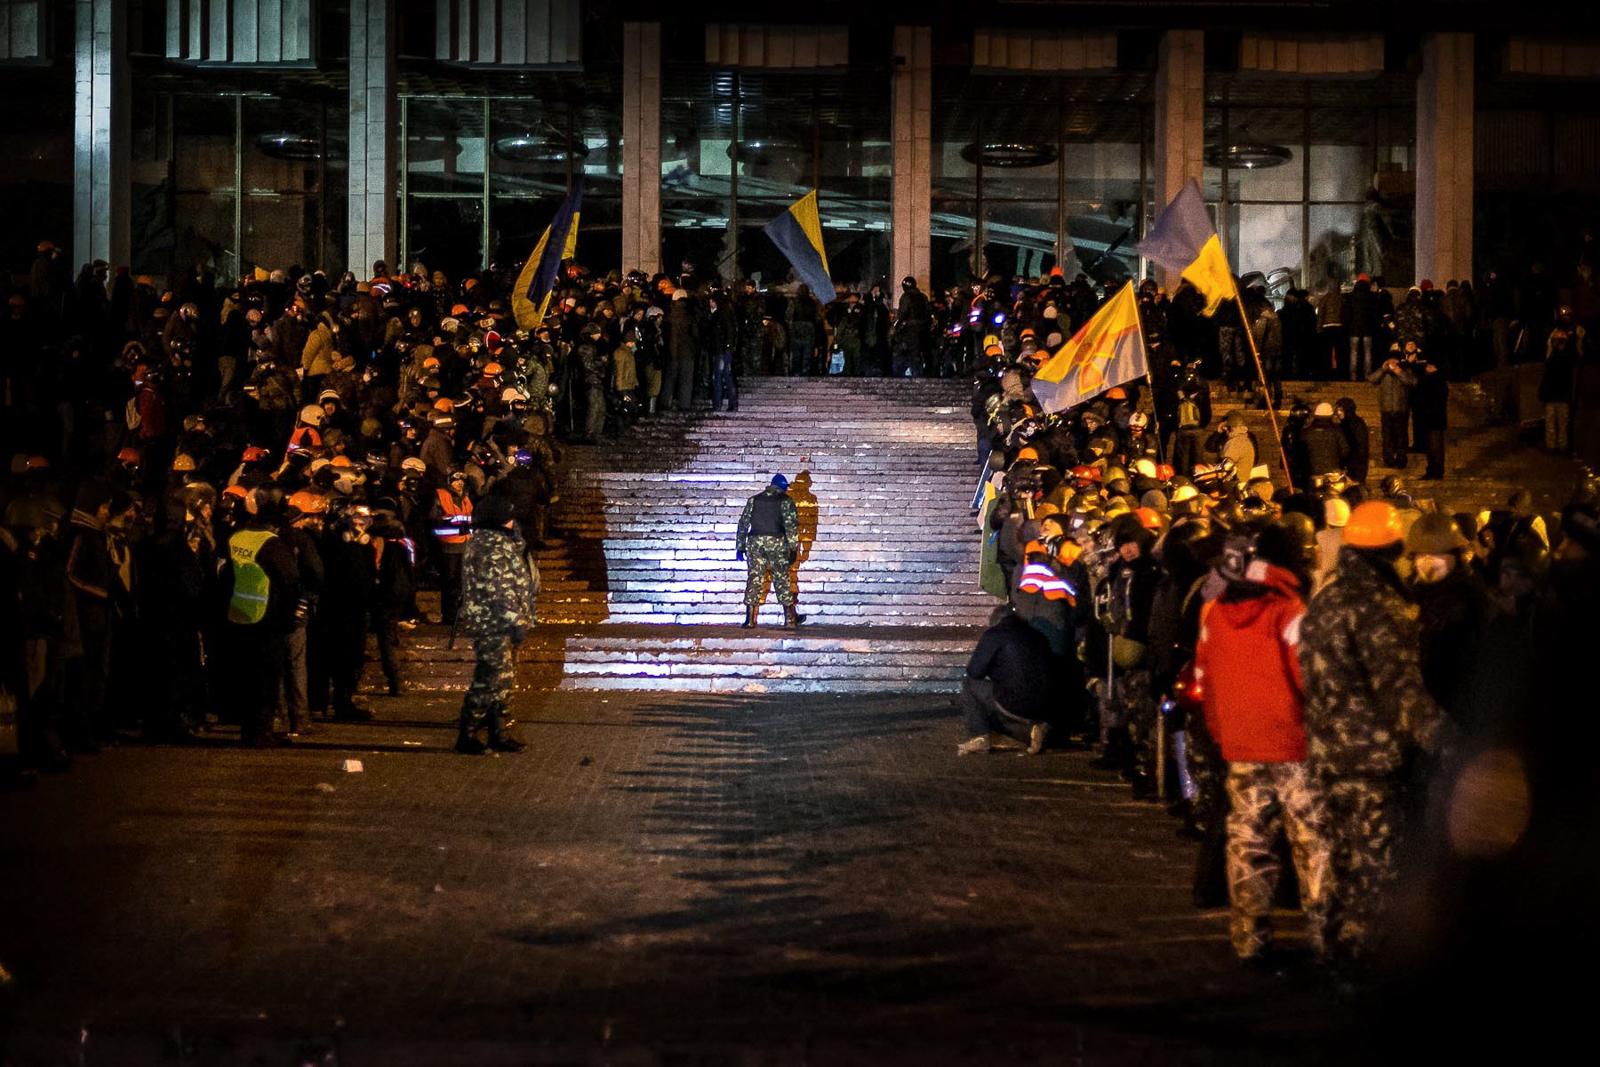 winter on fire ukraine 39 s fight for freedom 2015 bdc. Black Bedroom Furniture Sets. Home Design Ideas